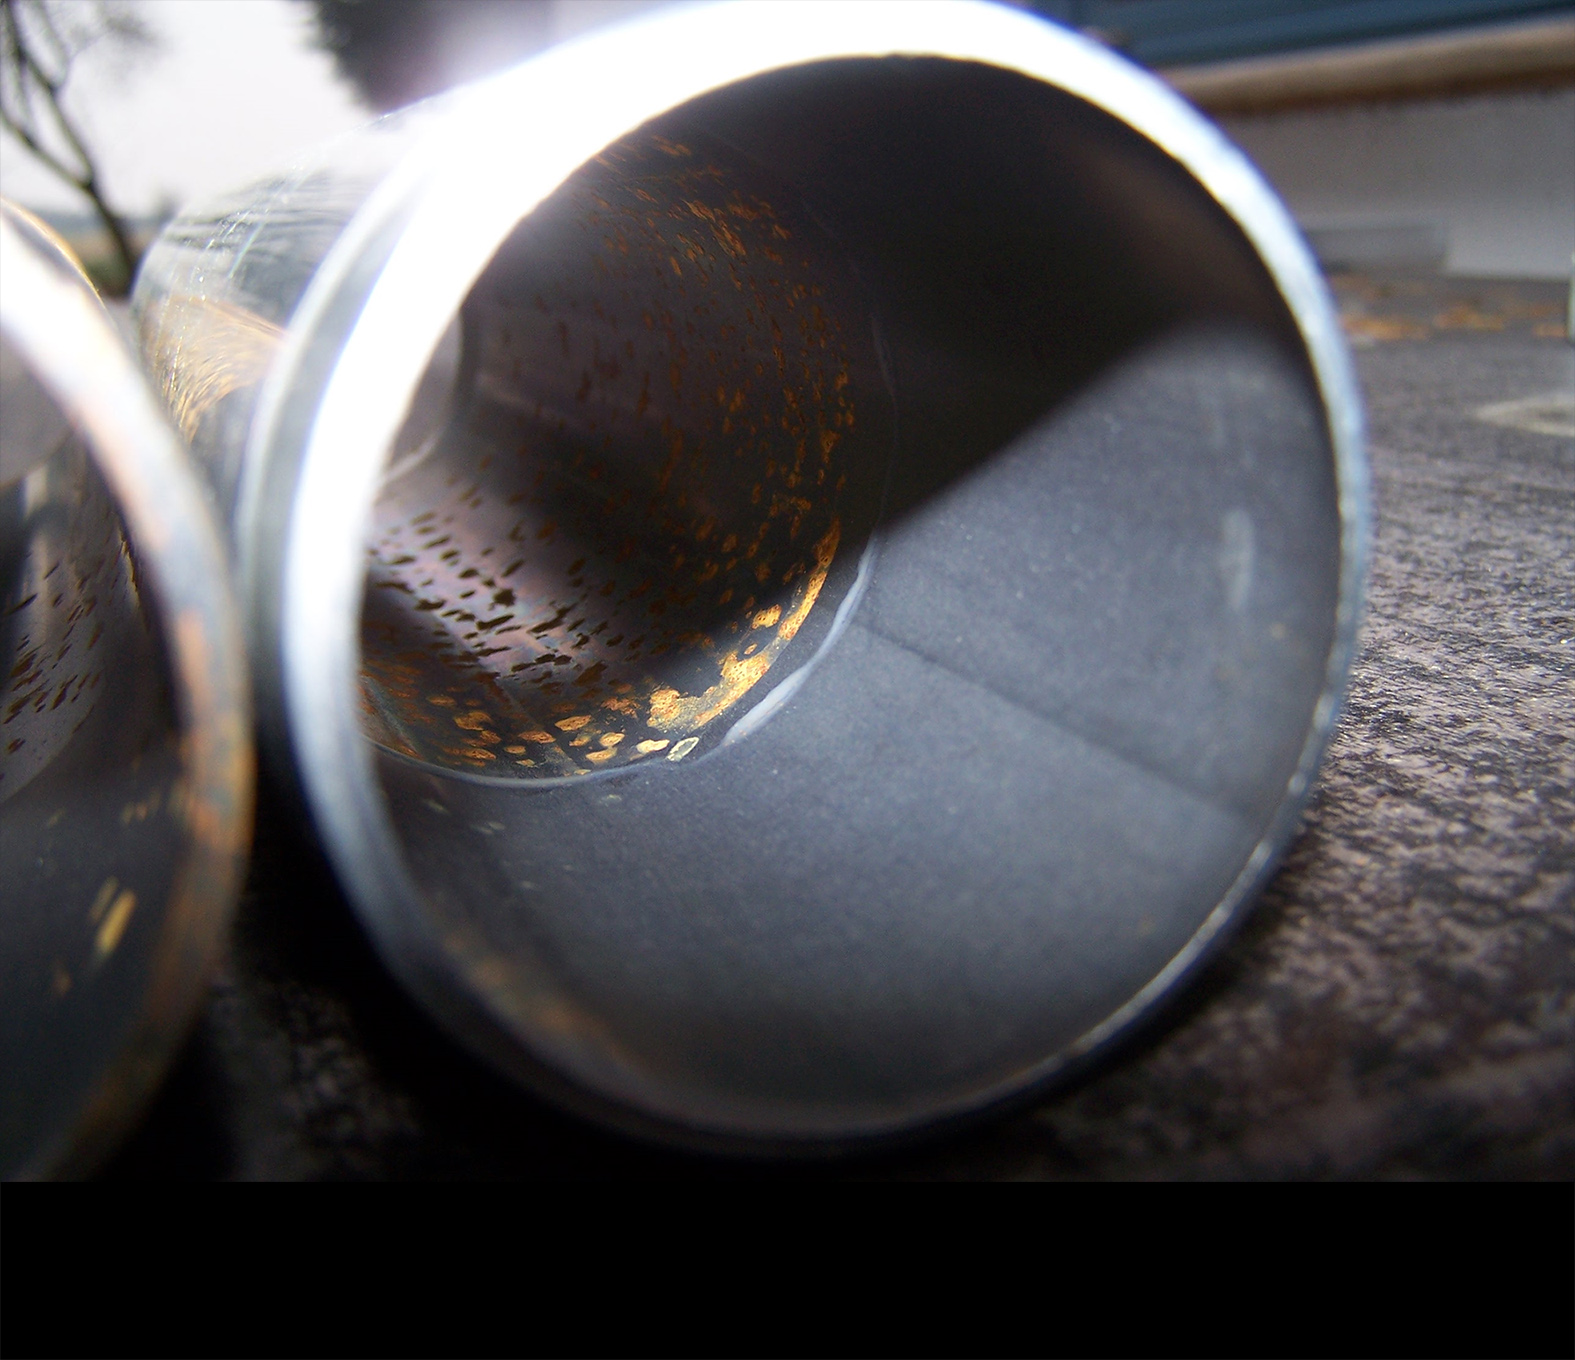 Stahlrohr - temporärer Korrosionsschutz